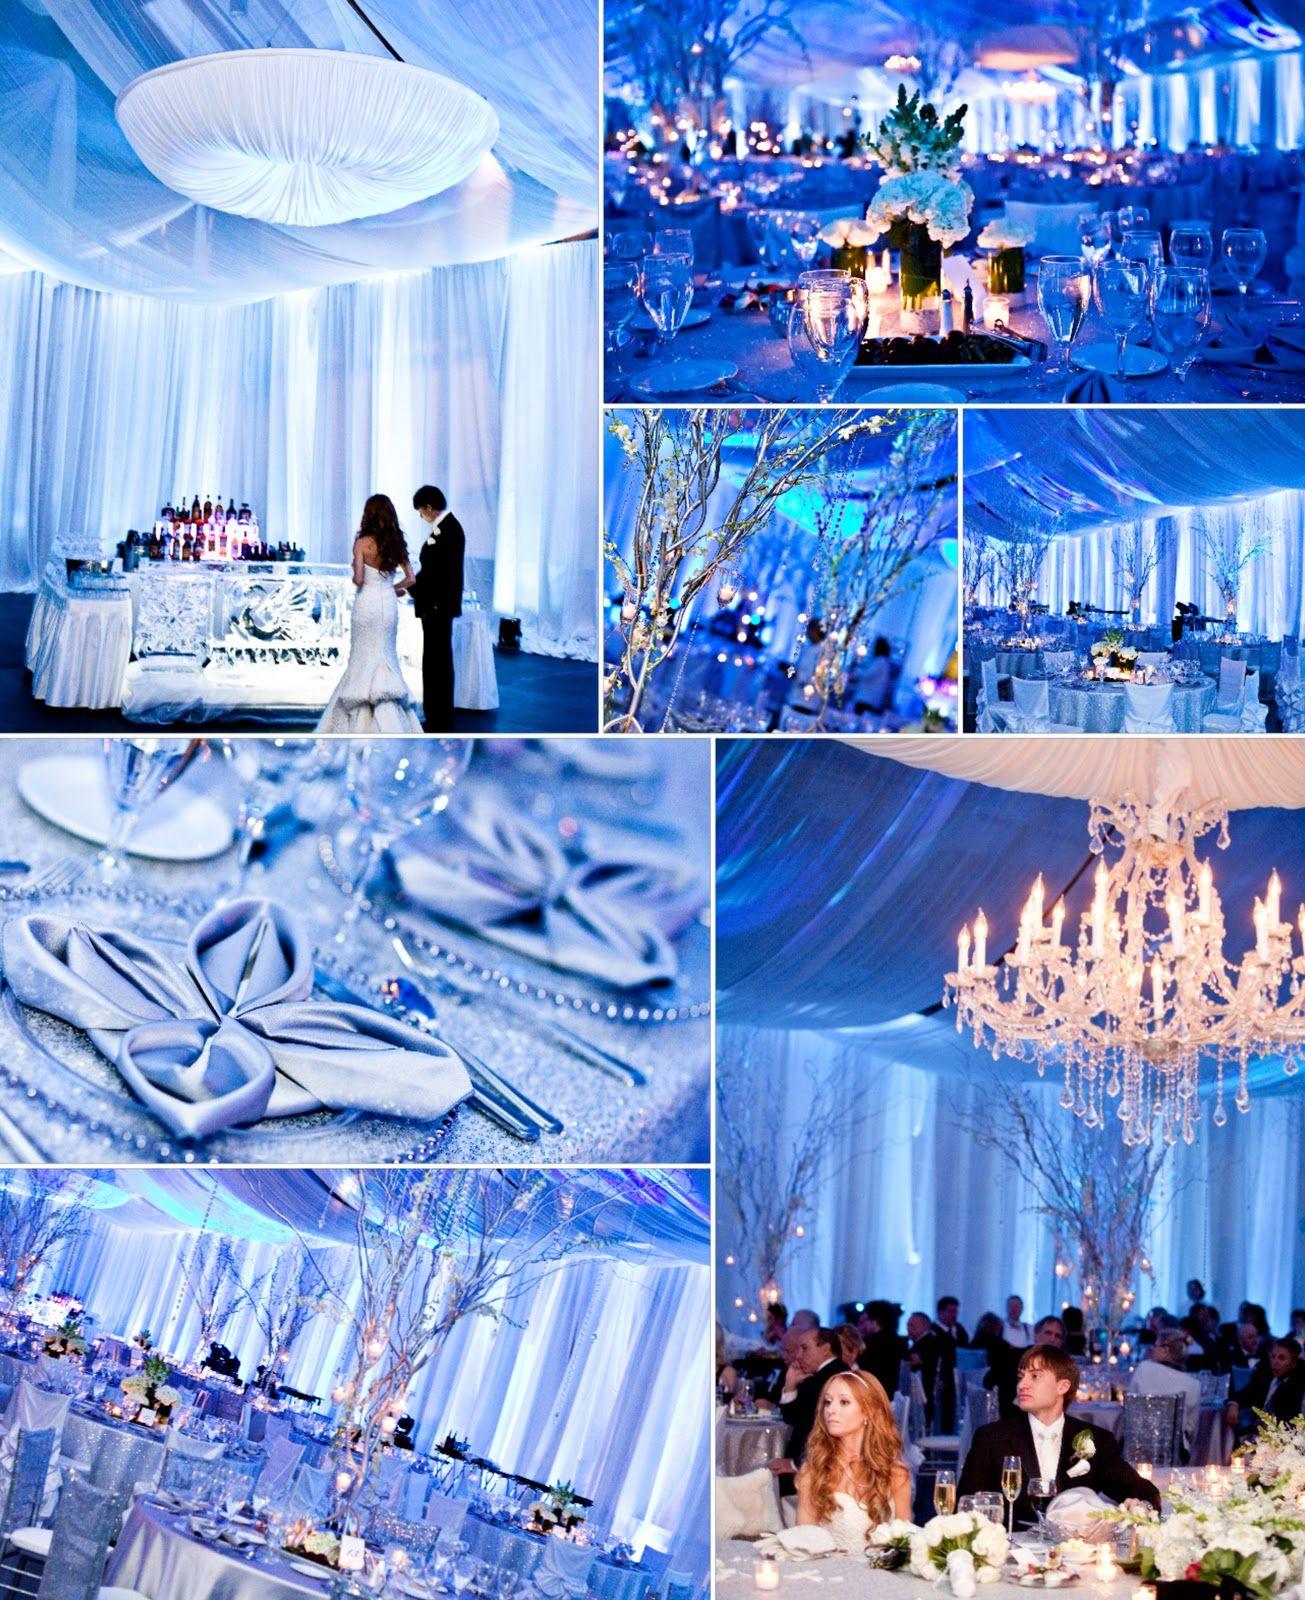 Wedding Ideas With A Difference: Winter Wonderland Wedding